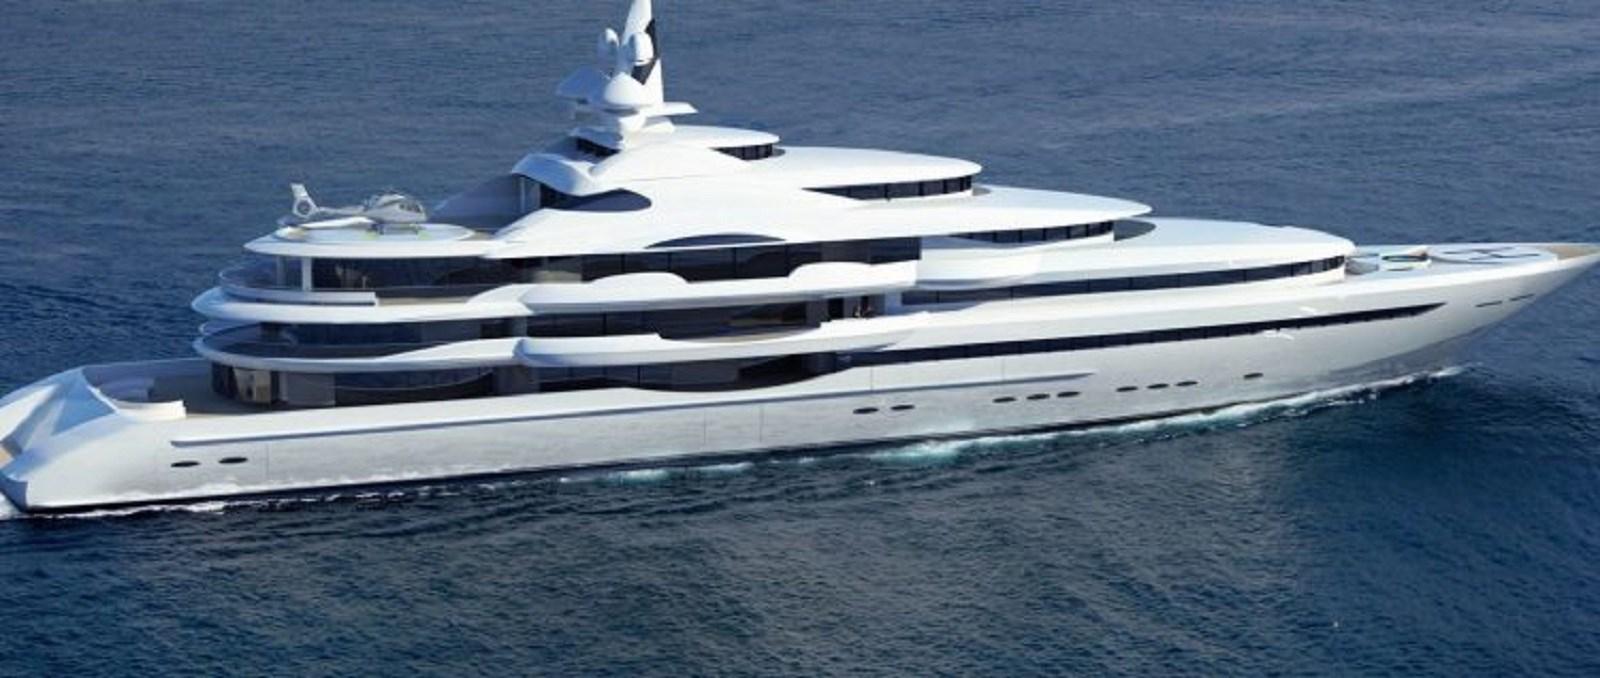 2407894_source 2023 BREMER VULKAN AG  Mega Yacht 2669410